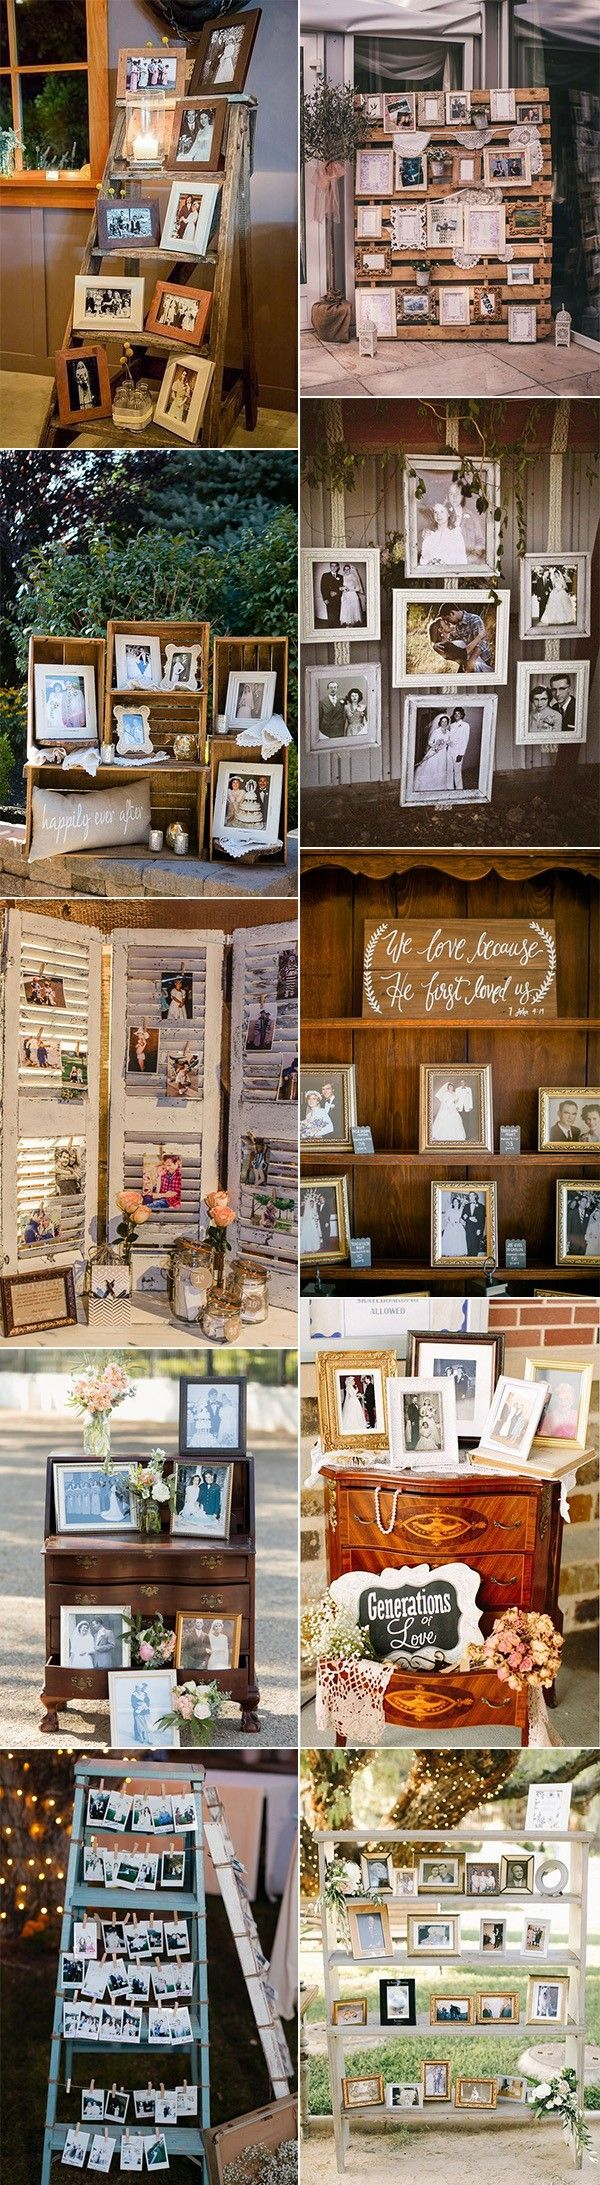 Viking wedding decorations october 2018  best Wedding images on Pinterest  Autumn Autumn weddings and